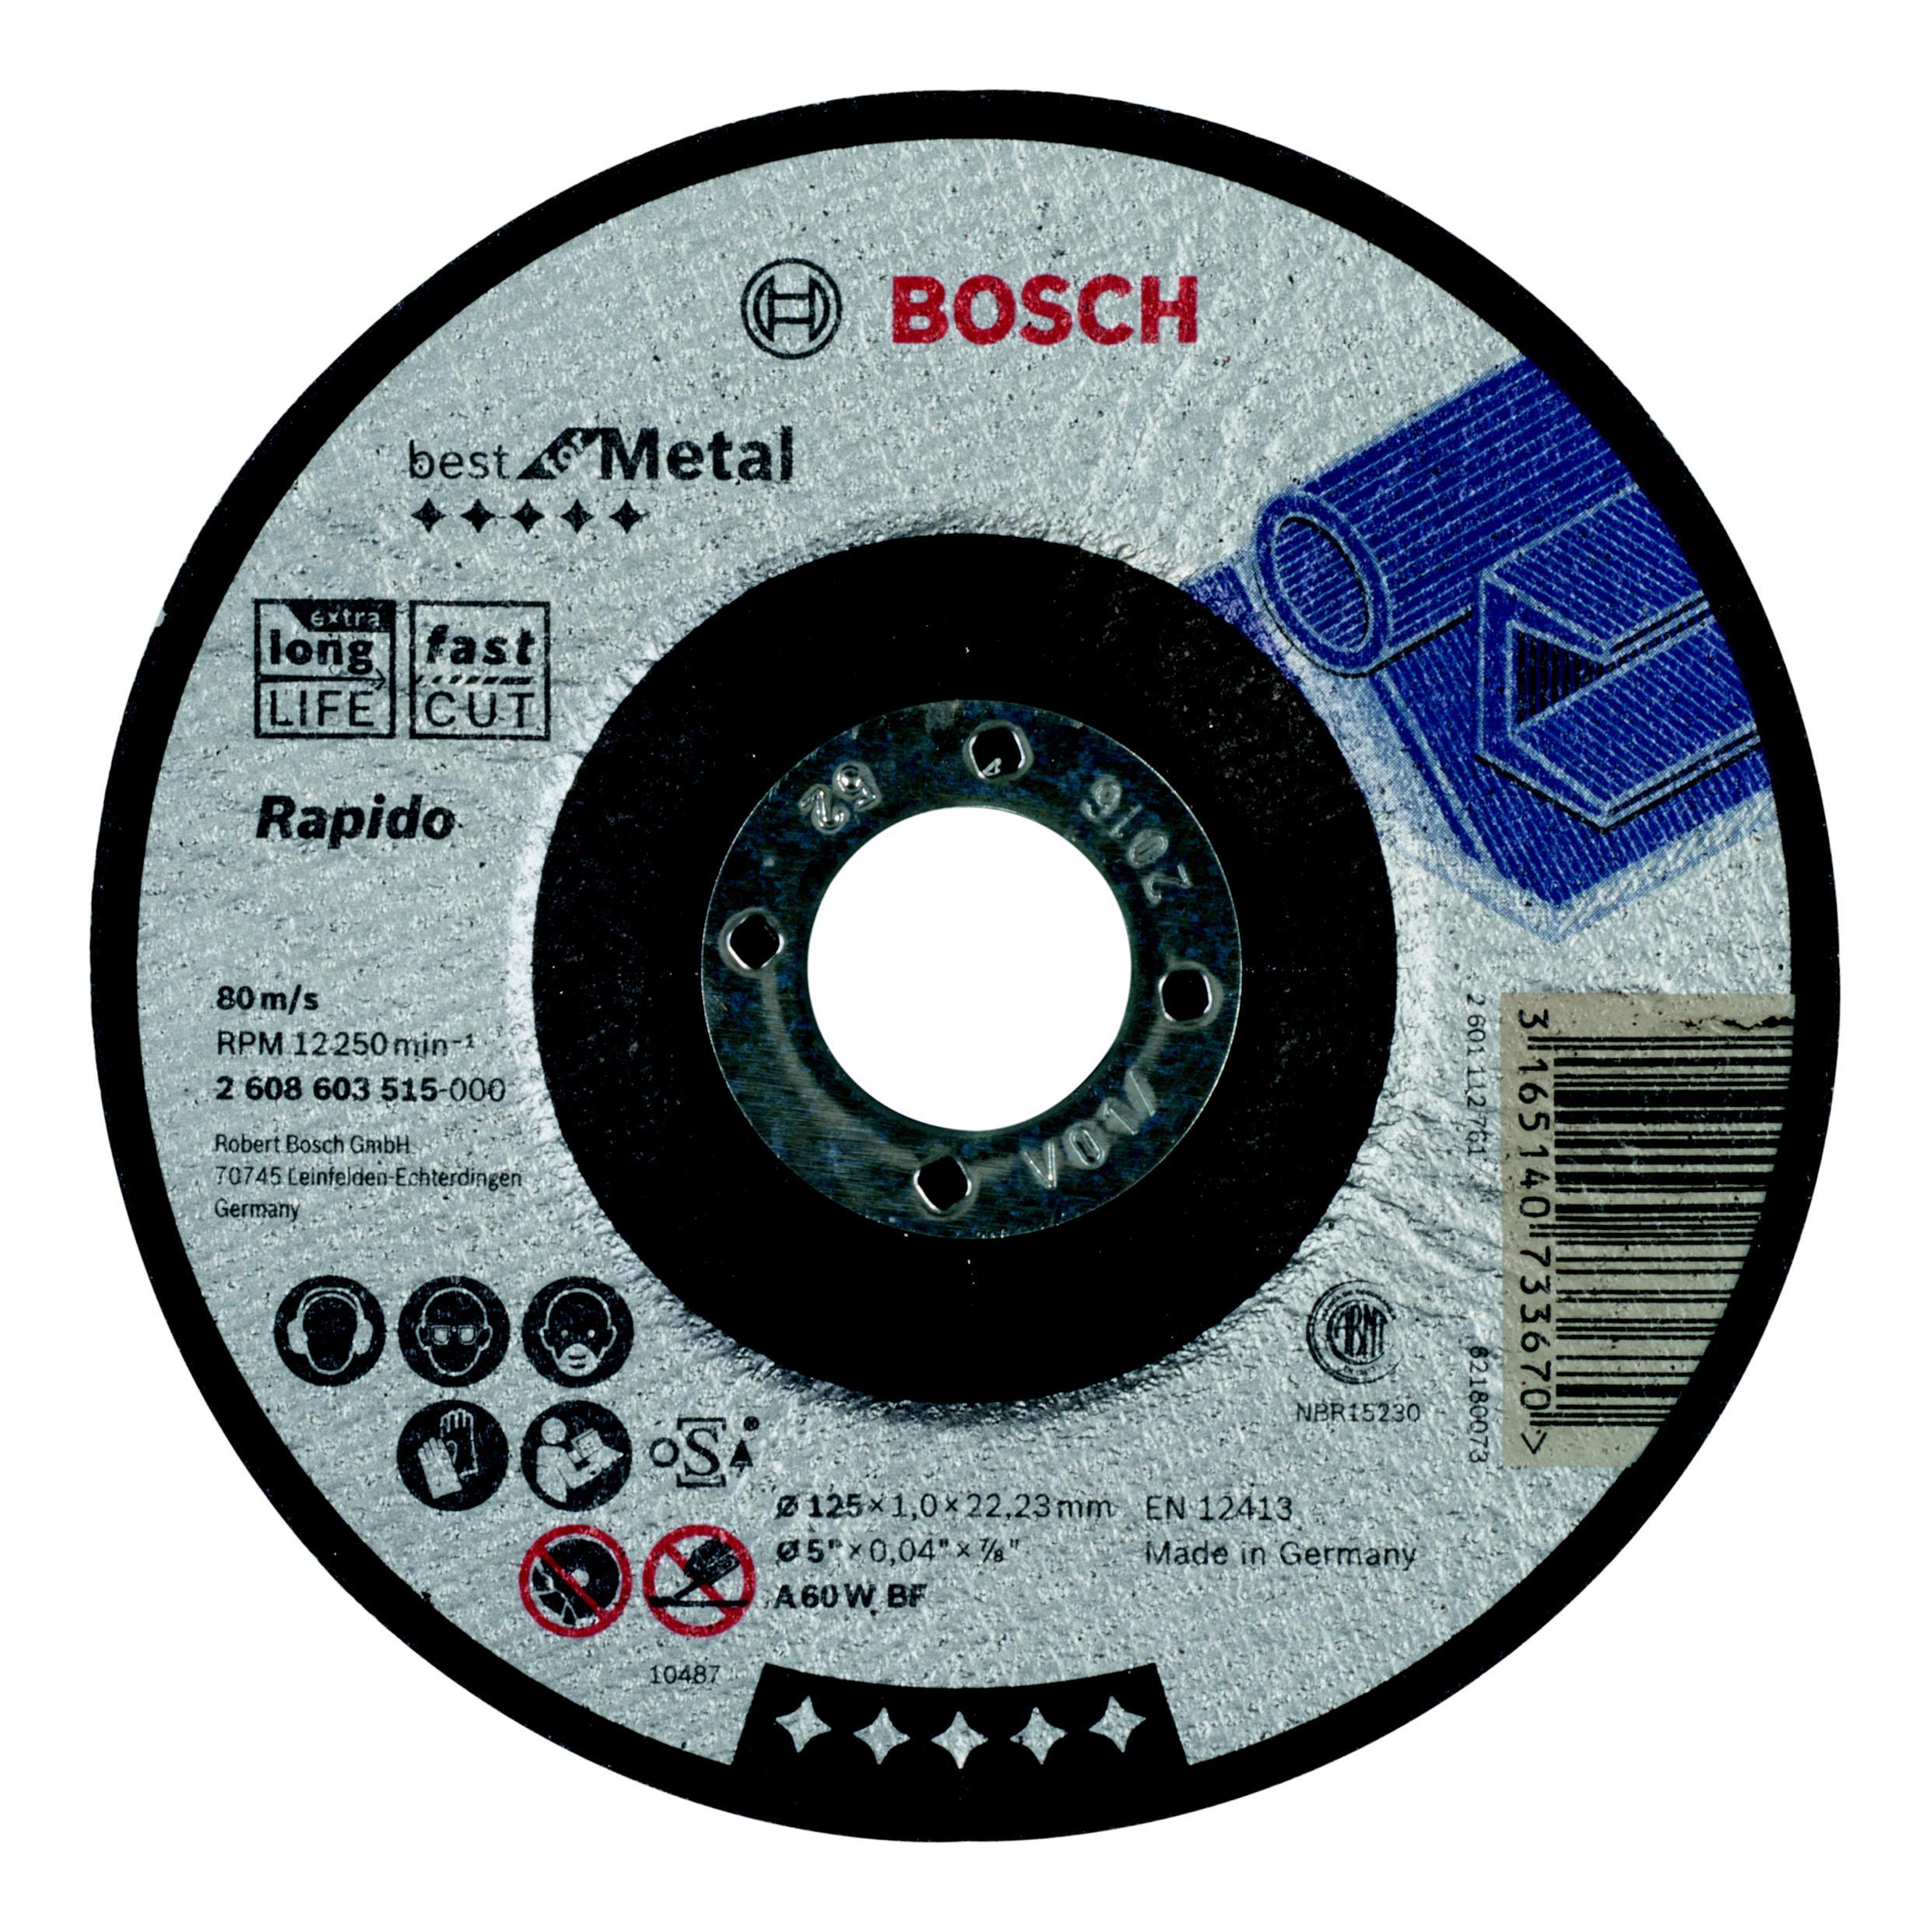 Круг отрезной Bosch 125х1х22 best for metal (2.608.603.515) круг отрезной bosch 115х1 5х22 best for metal 2 608 603 517